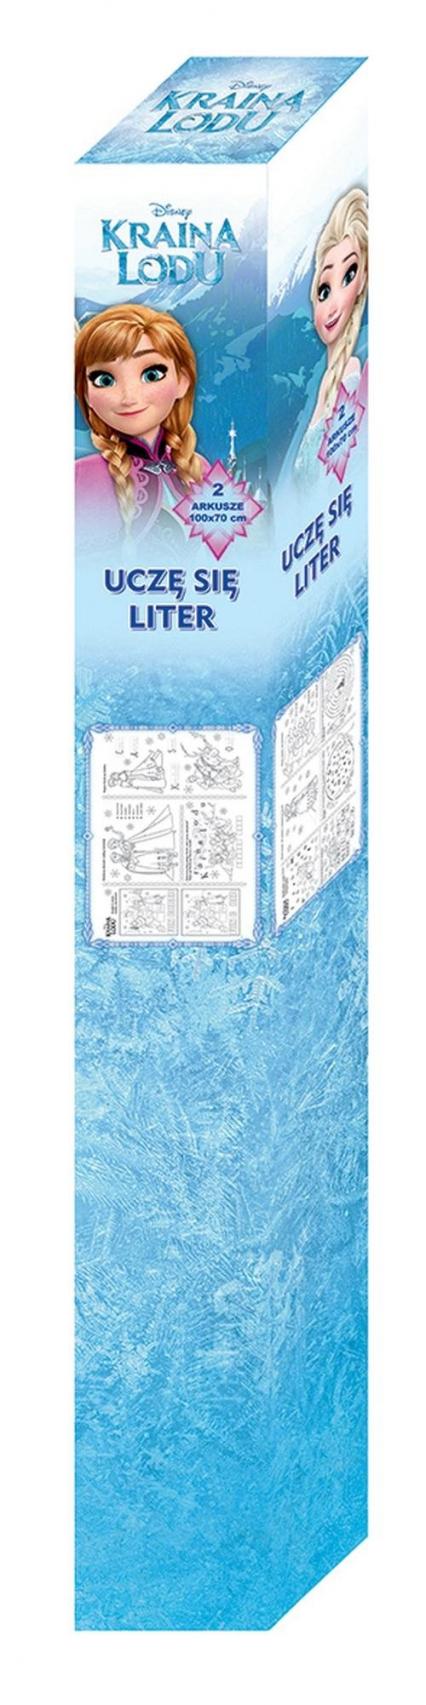 Kraina lodu Alfabet tablice -  | okładka